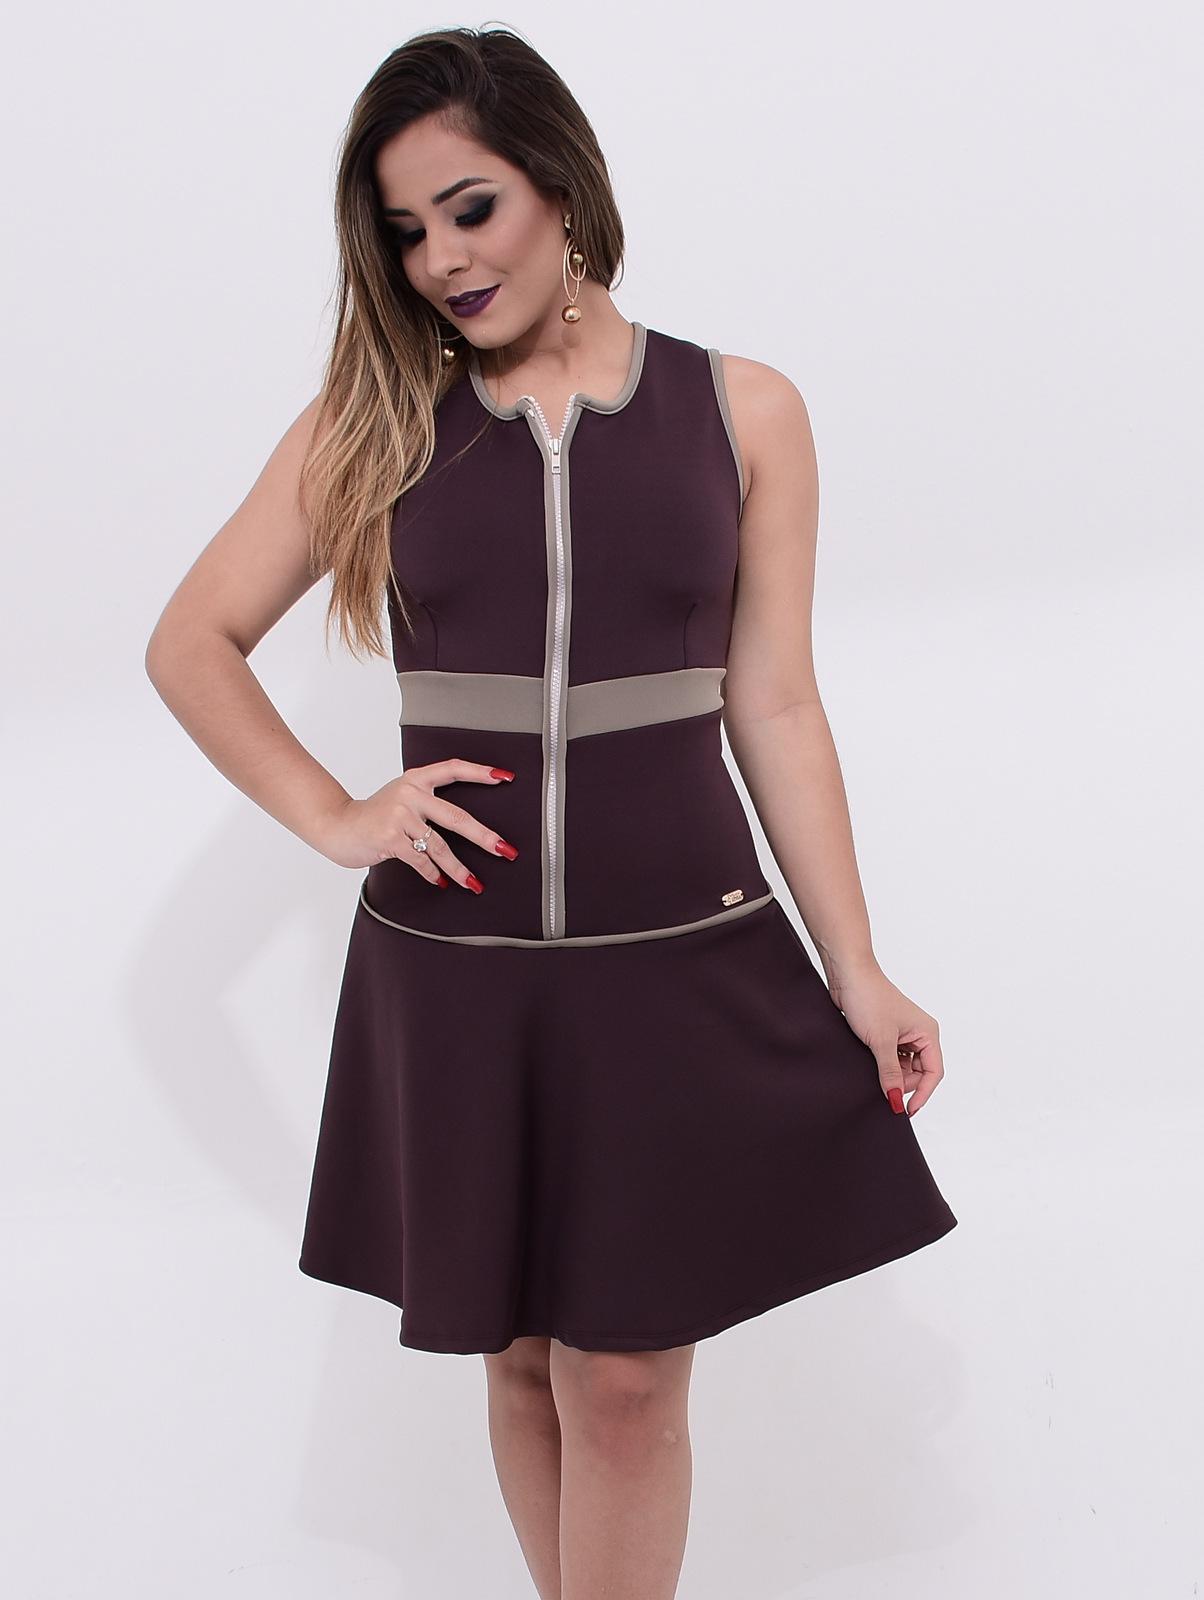 vestido marrom de neoprene